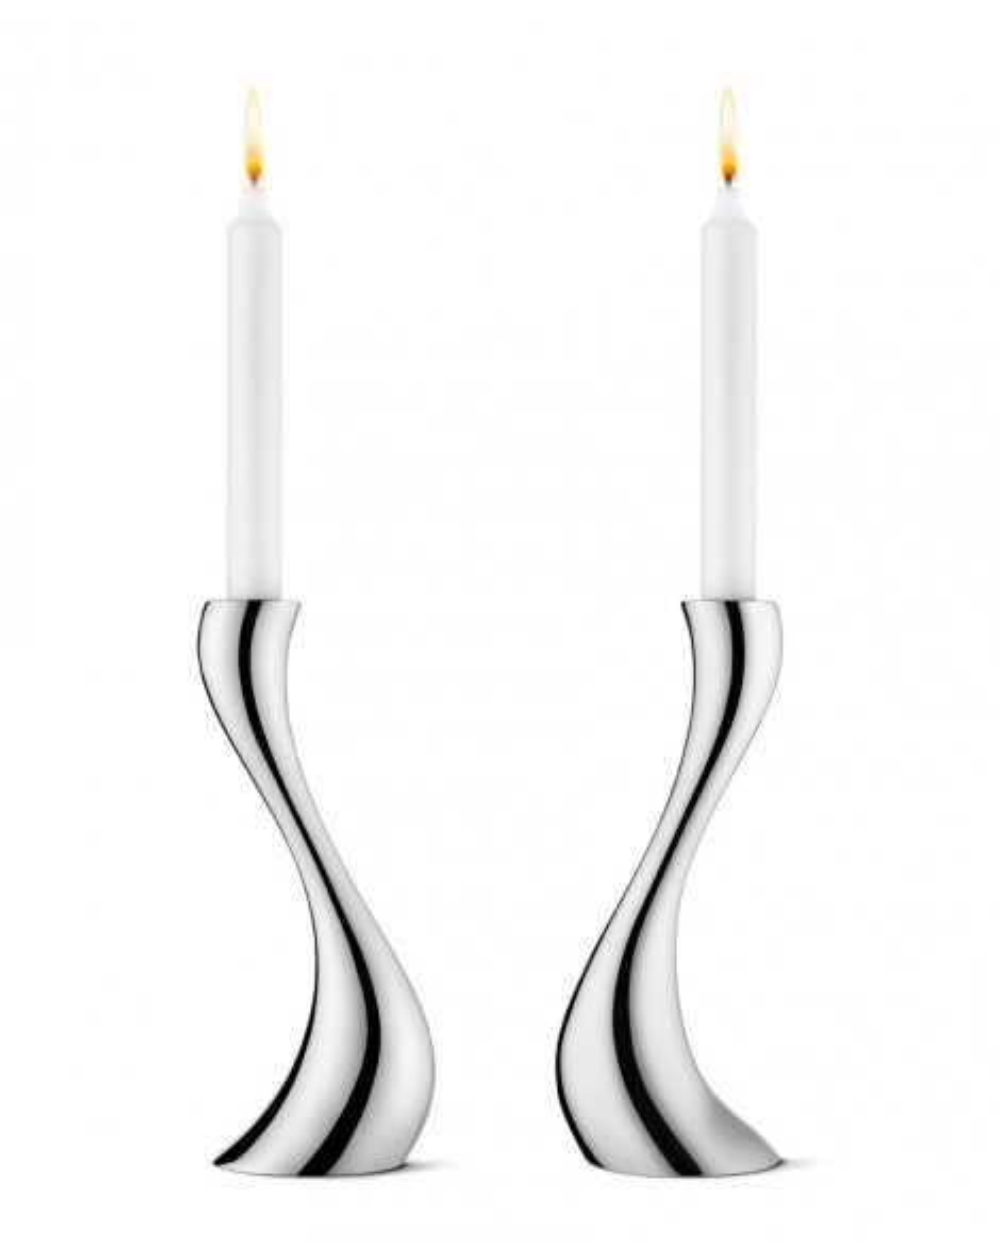 Cobra Candlesitcks Georg Jensen